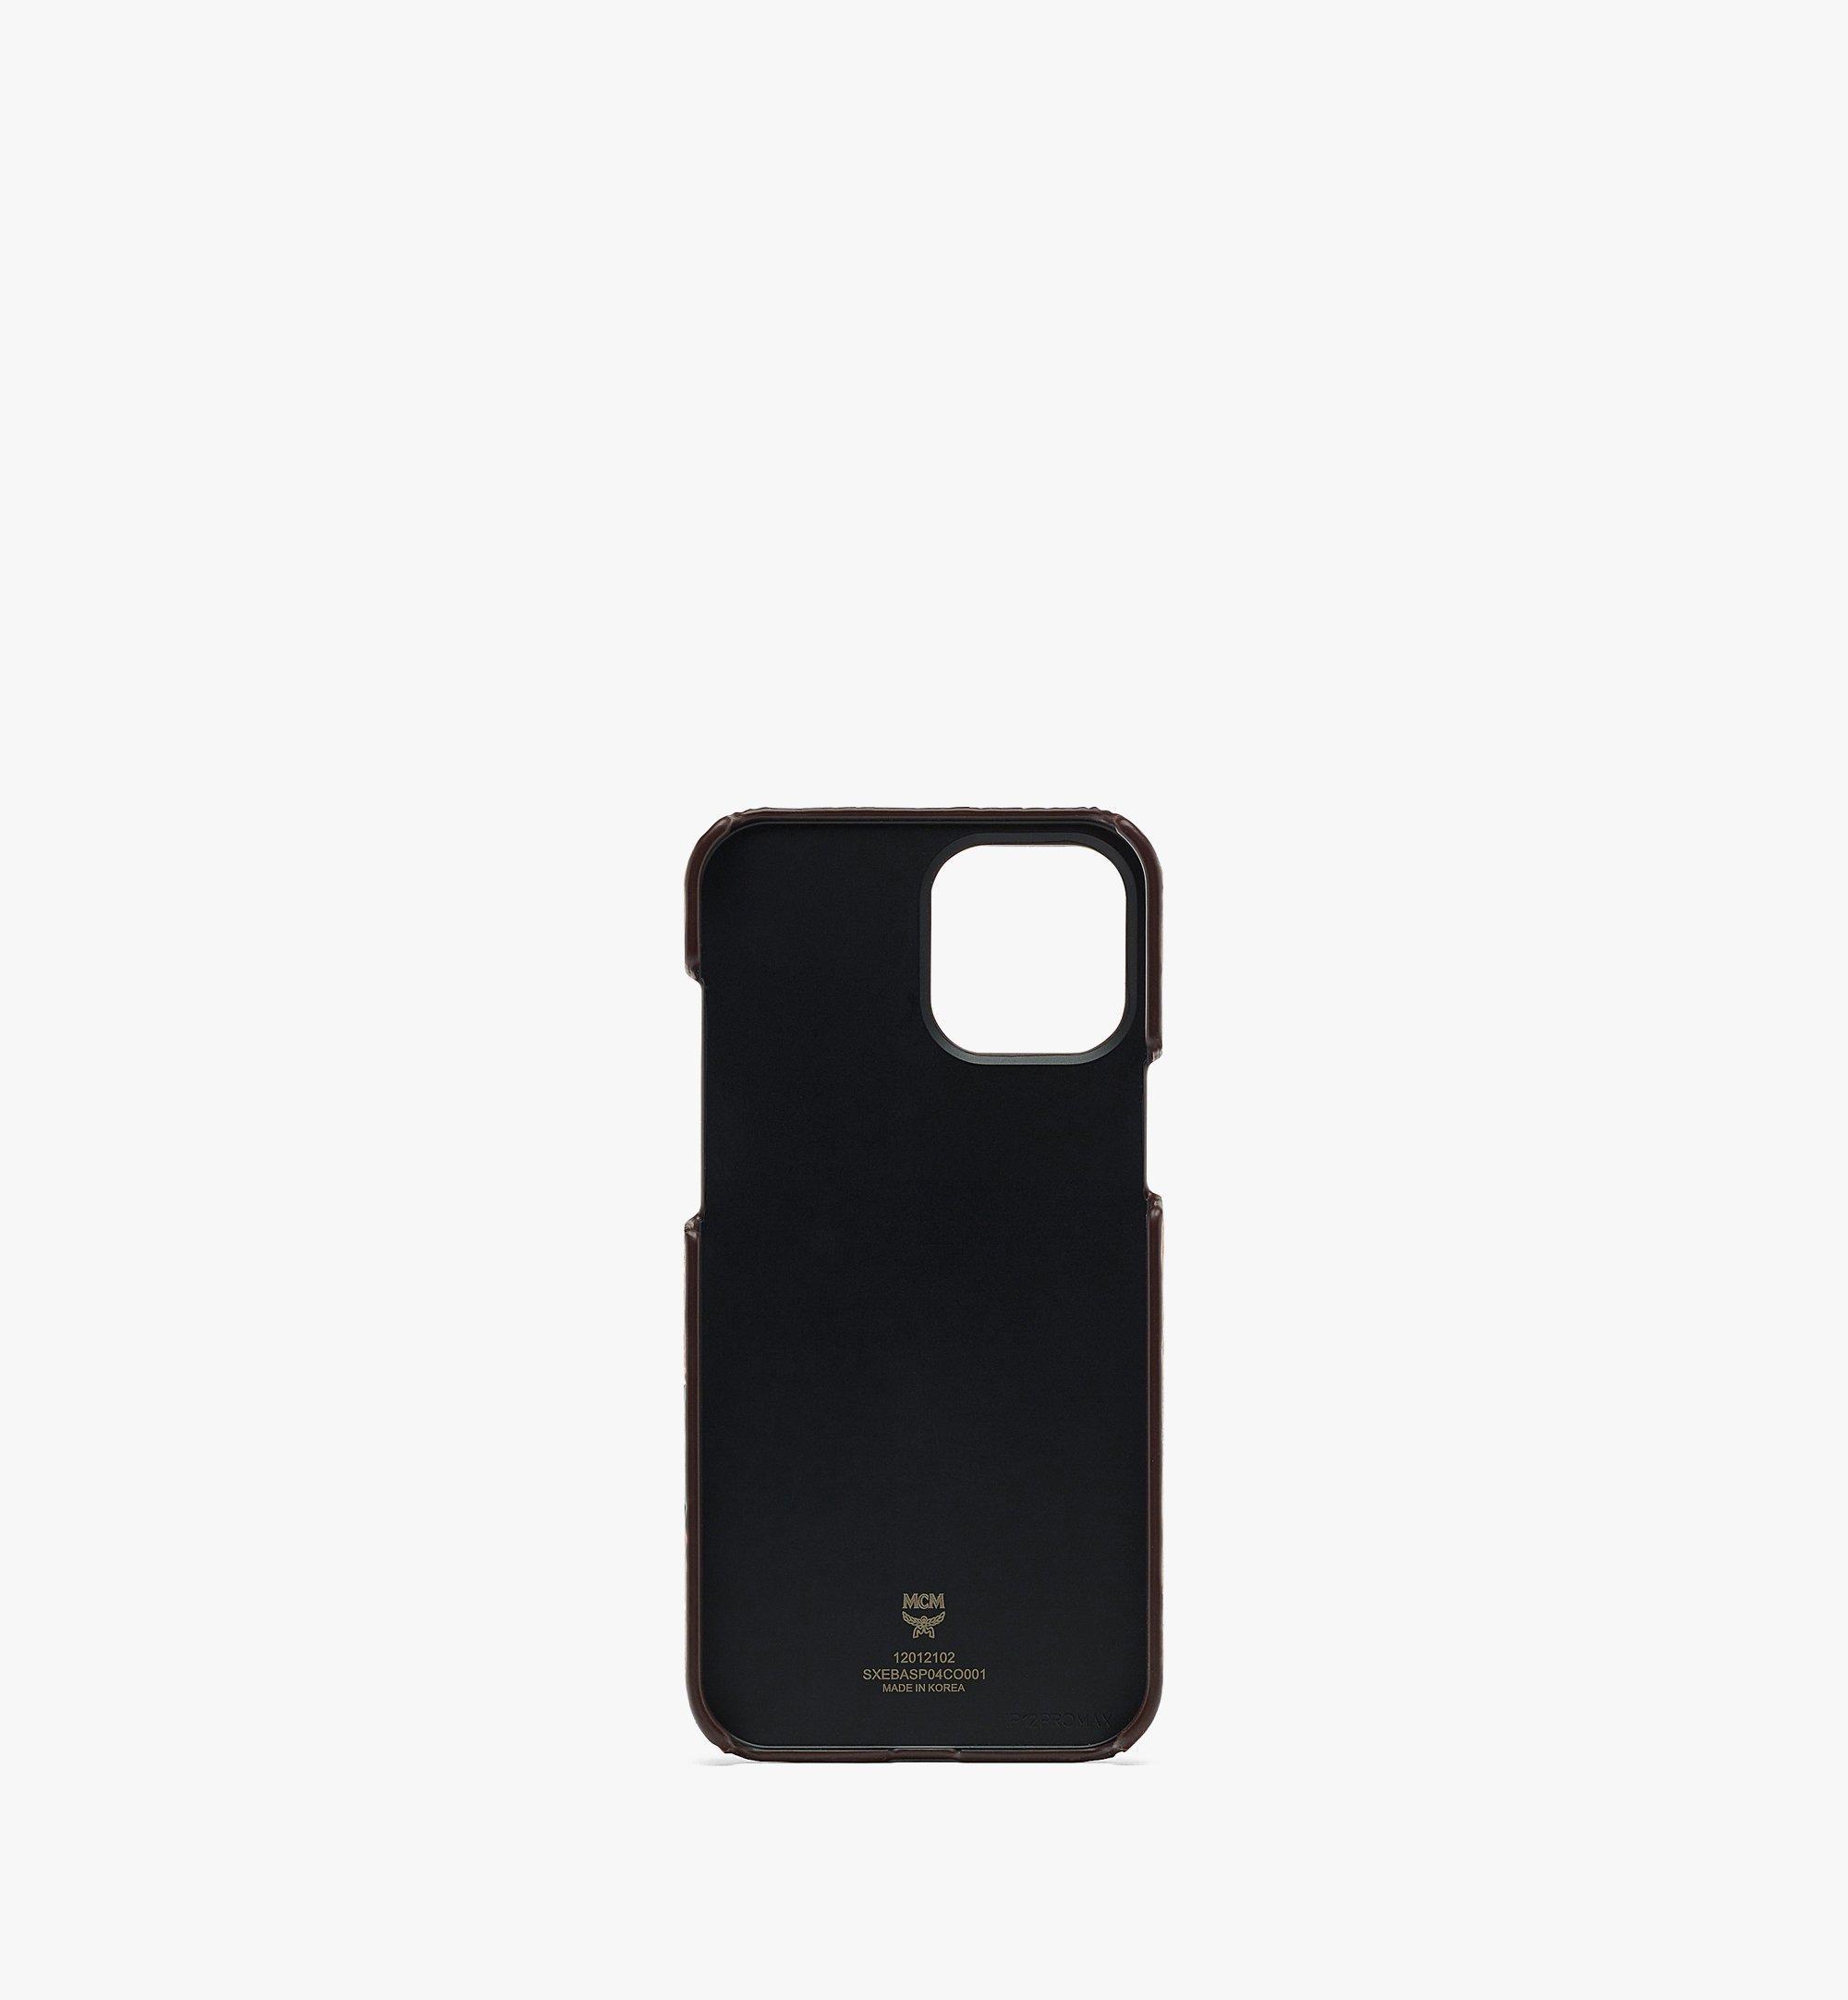 MCM MCM x SAMBYPEN iPhone 12 Pro Max 手機保護套 Cognac MXEBASP04CO001 更多視圖 1